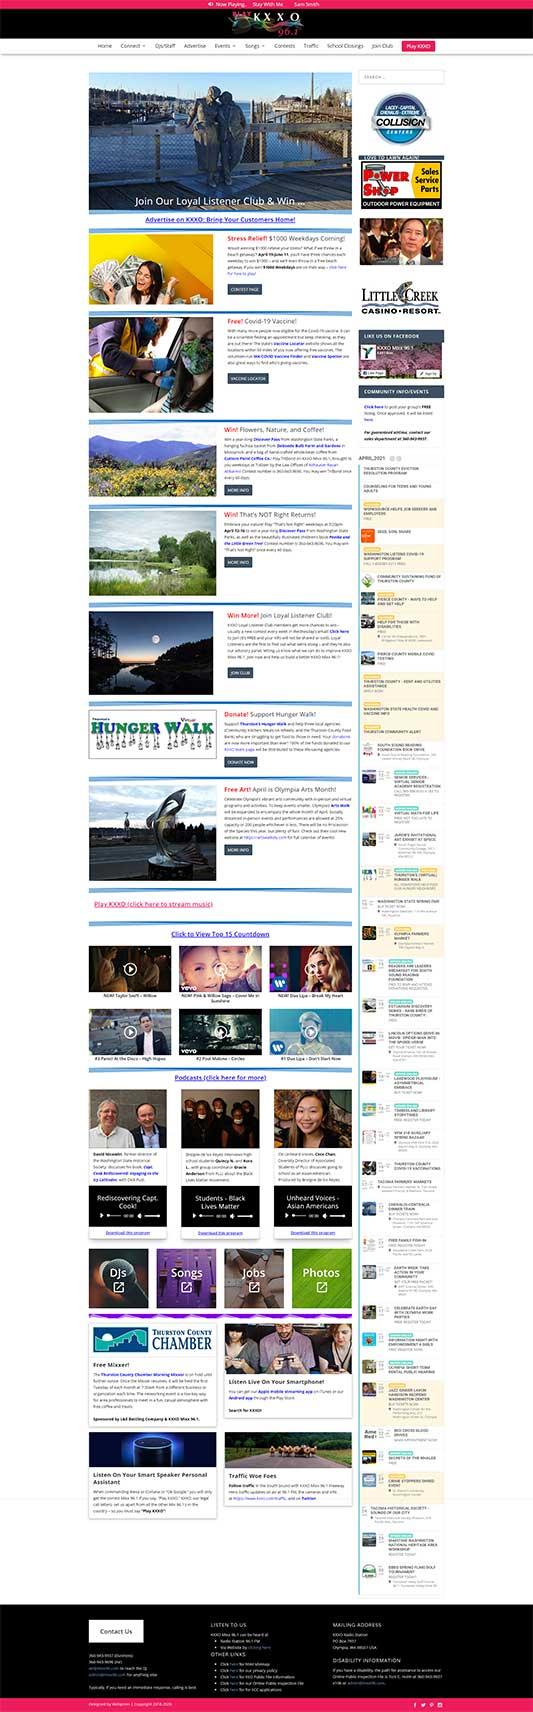 KXXO Mixx 96.1 Radio Home Page